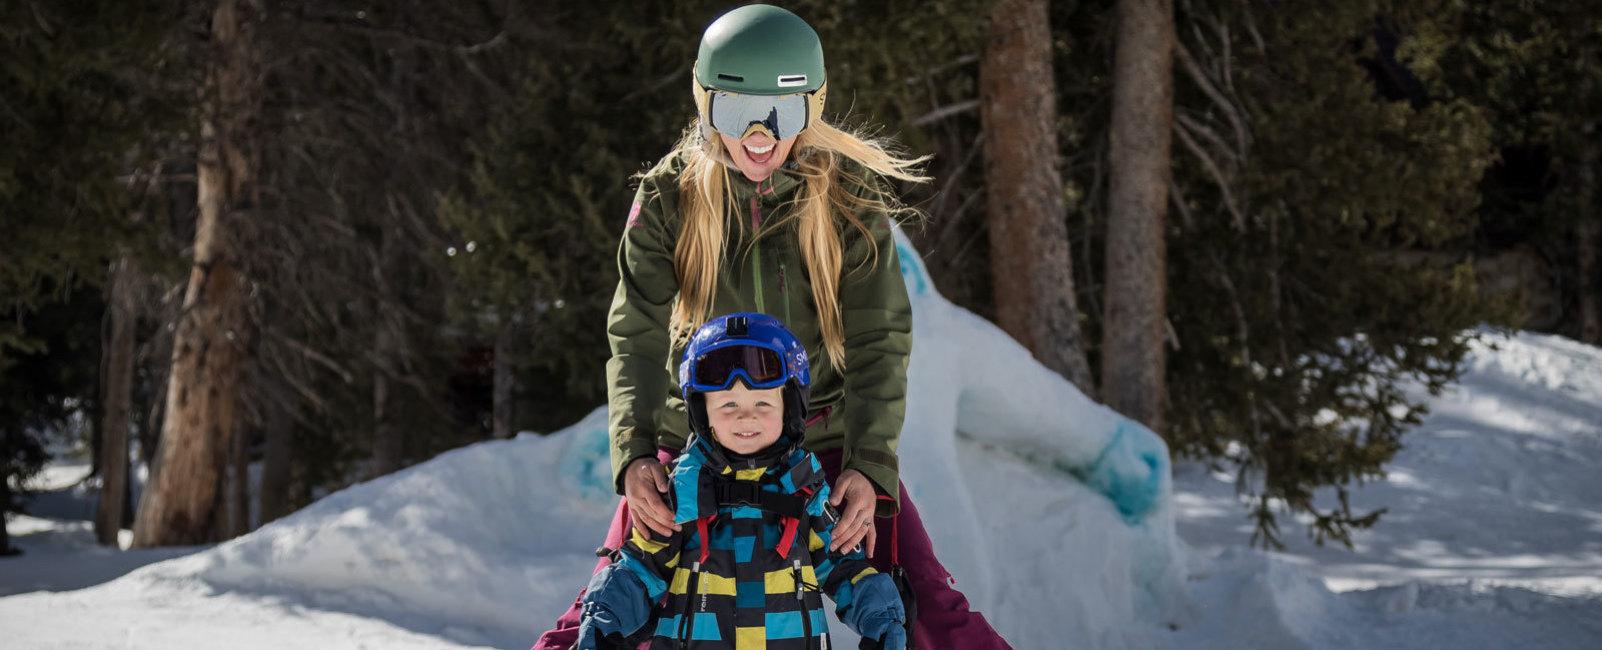 Growing a Skier at Brighton: One of Utah's Favorite Resorts for Beginners